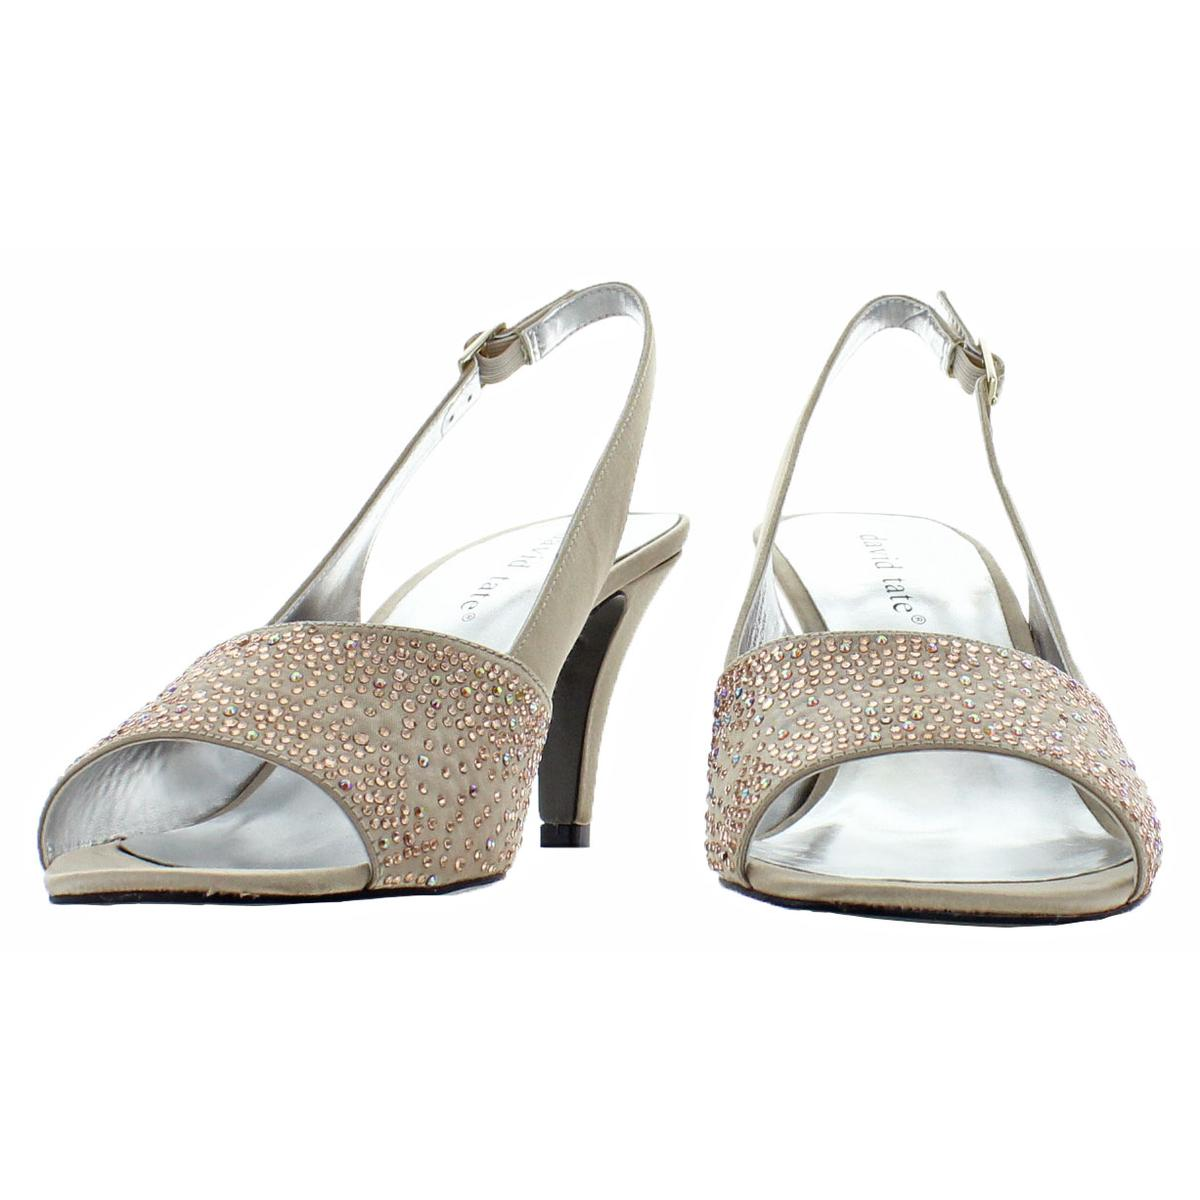 David-Tate-Women-039-s-Stunning-Satin-Embellished-Slingback-Dress-Pump thumbnail 7